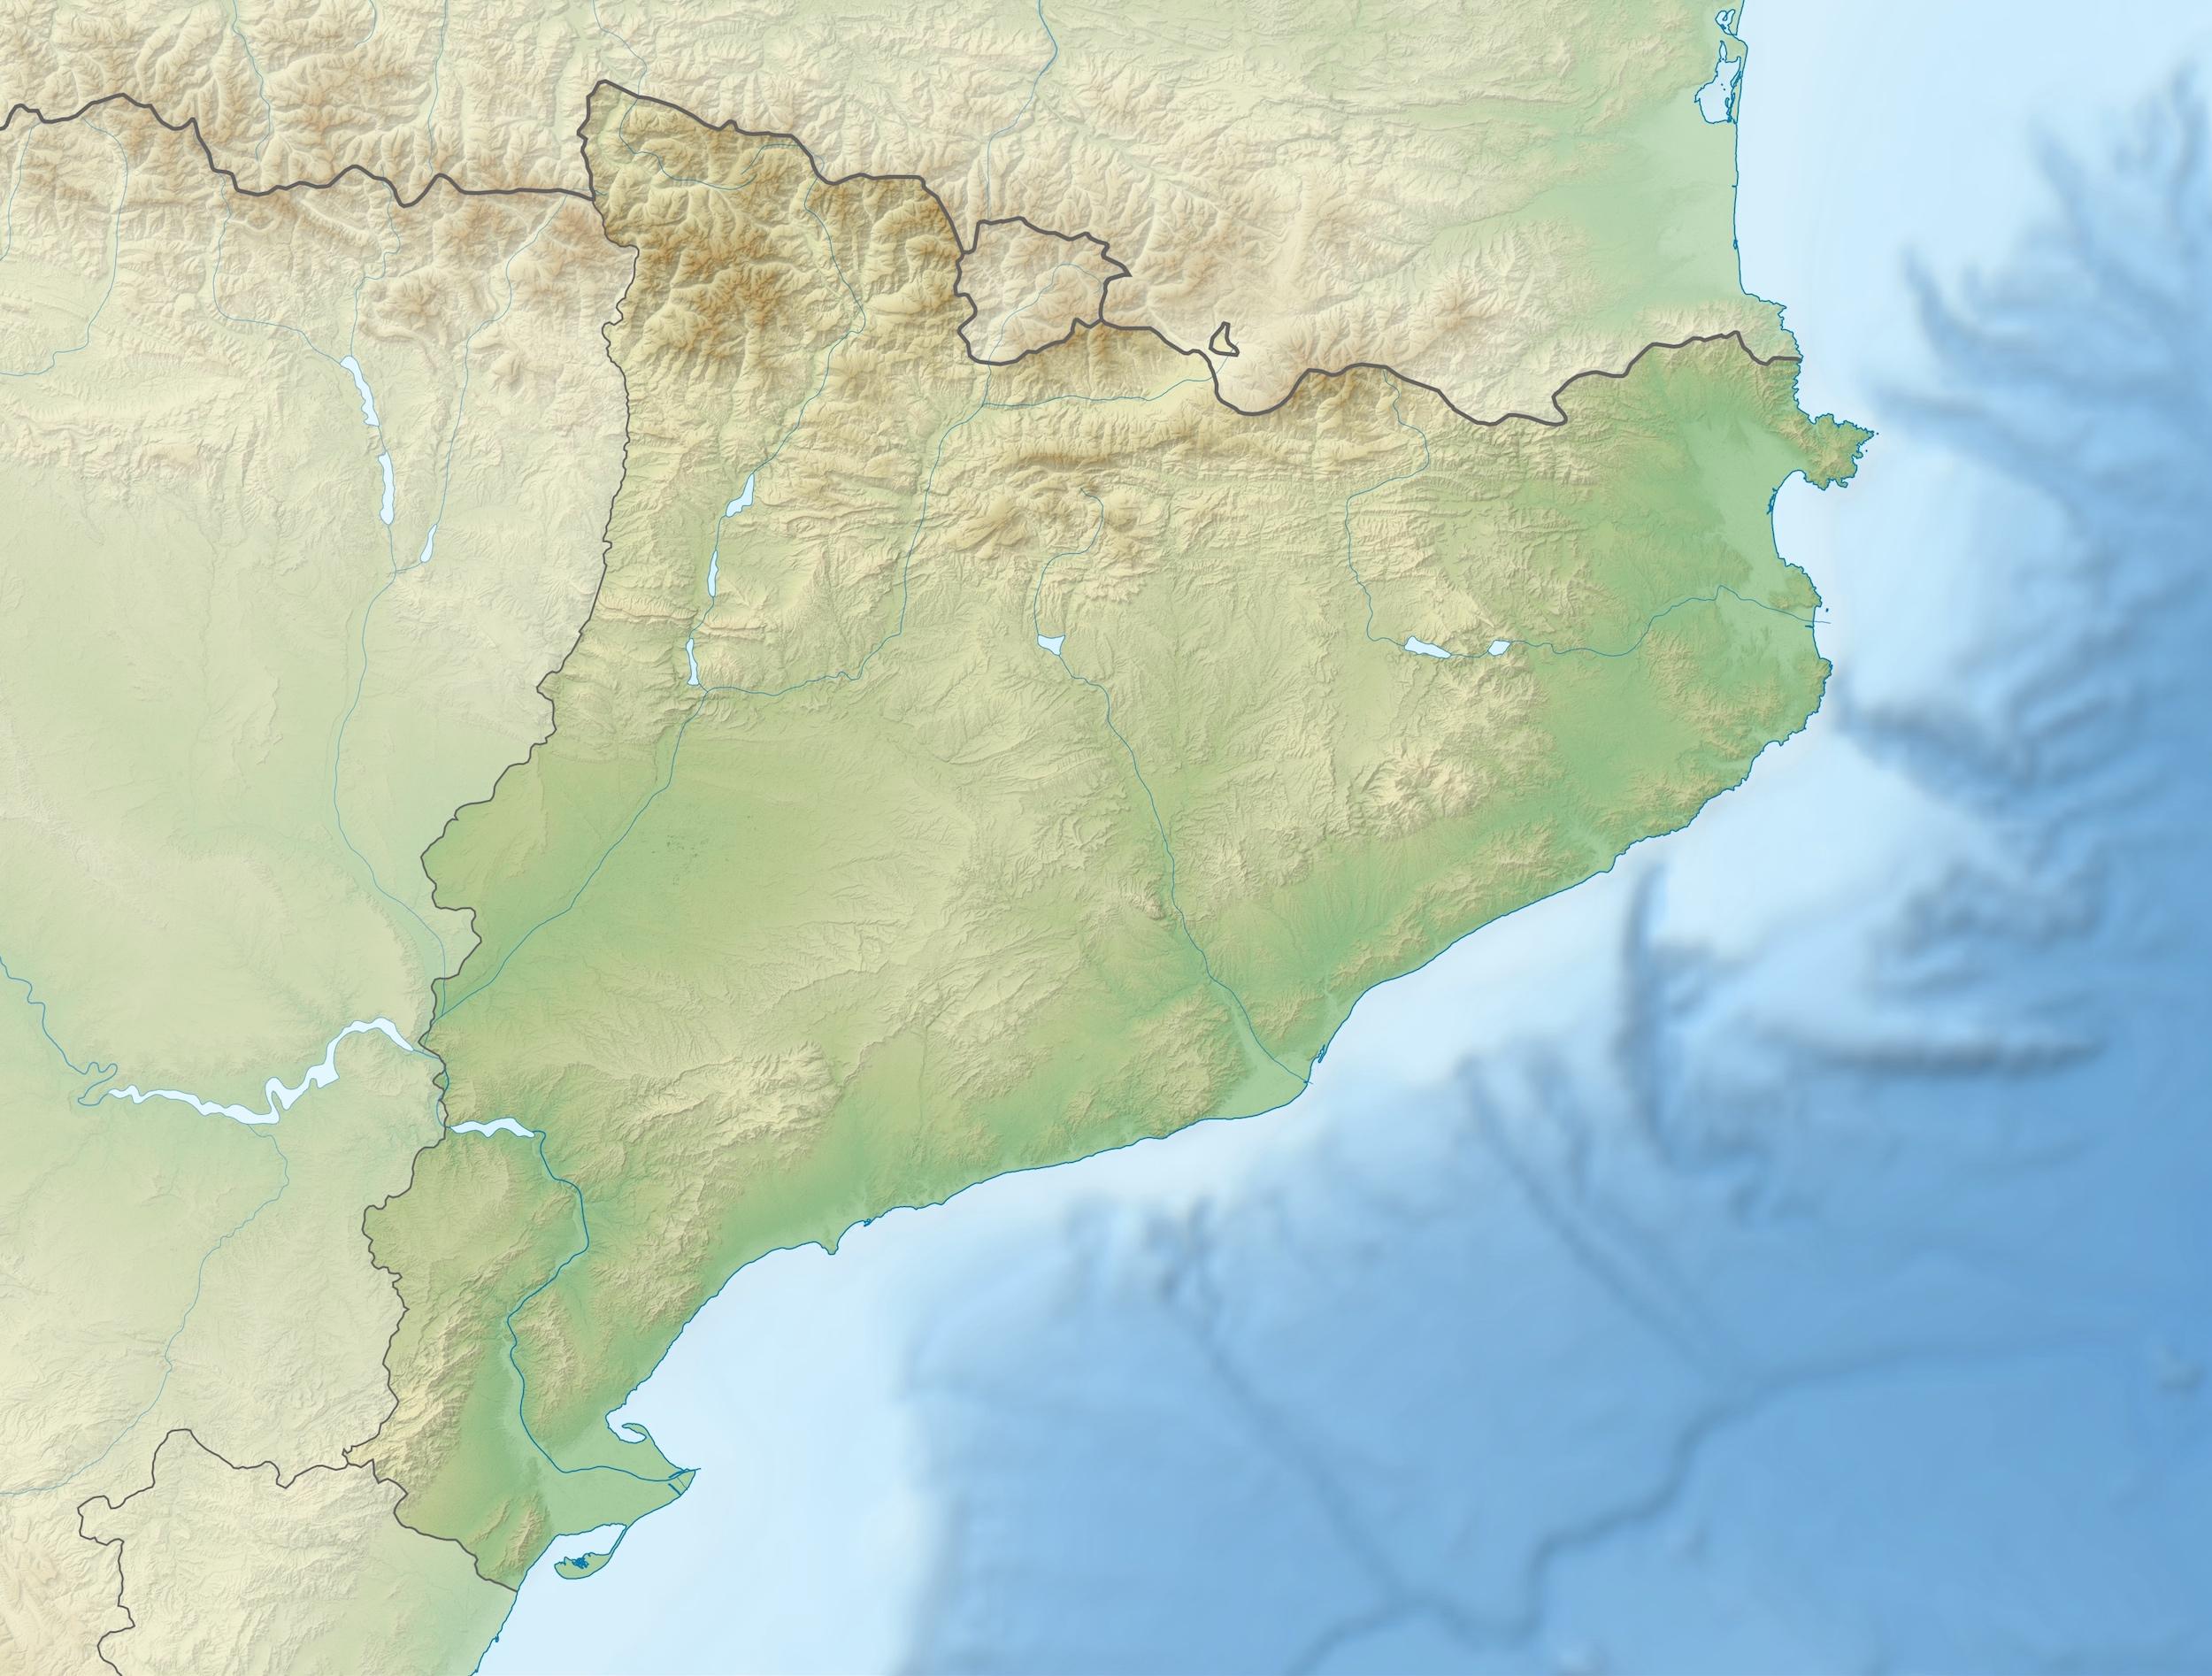 Carte Espagne Topographique.Espagne Catalogne Topographique Carte Populationdata Net